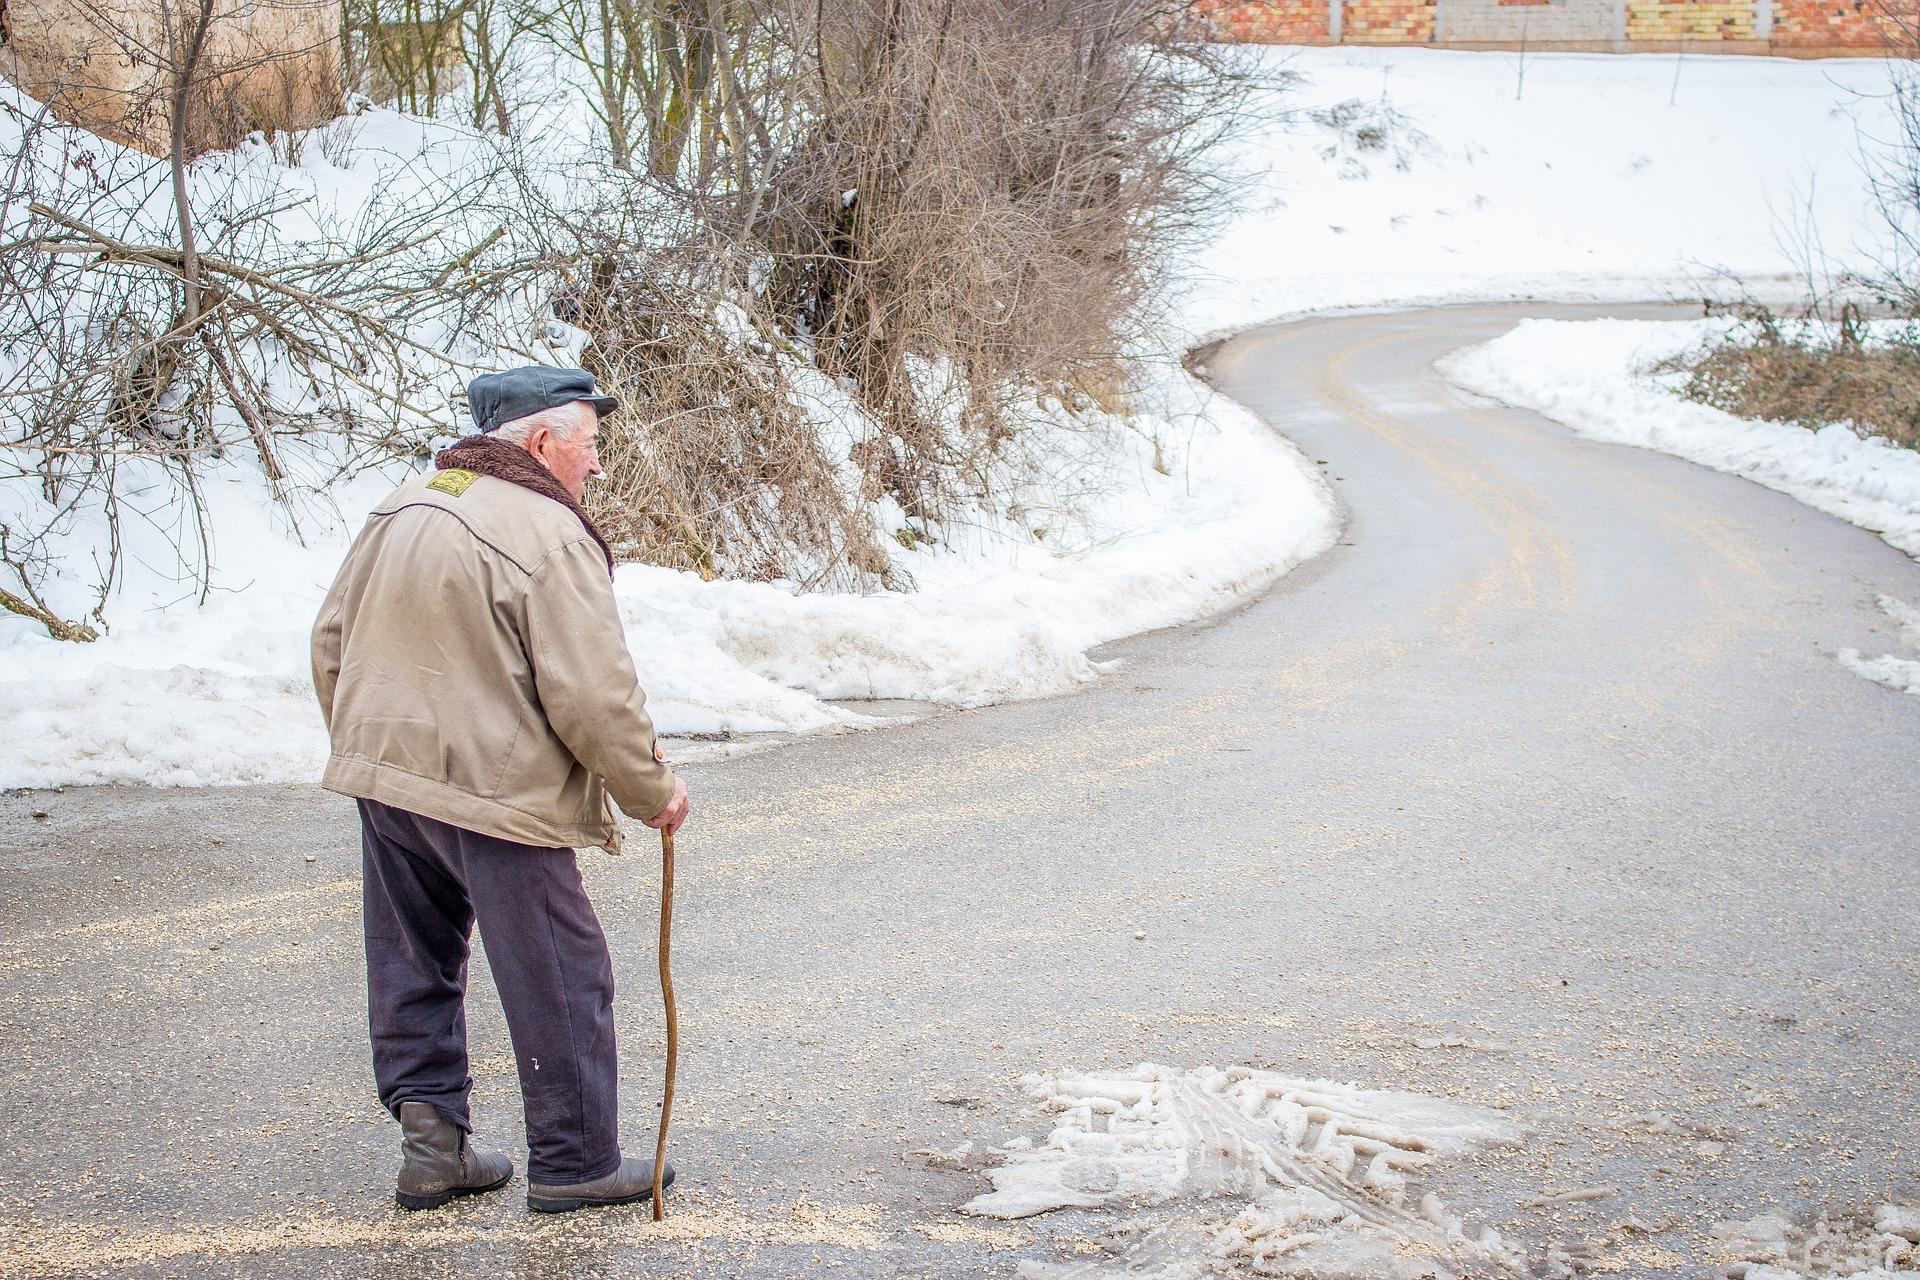 Онлайн кредит для пенсионеров